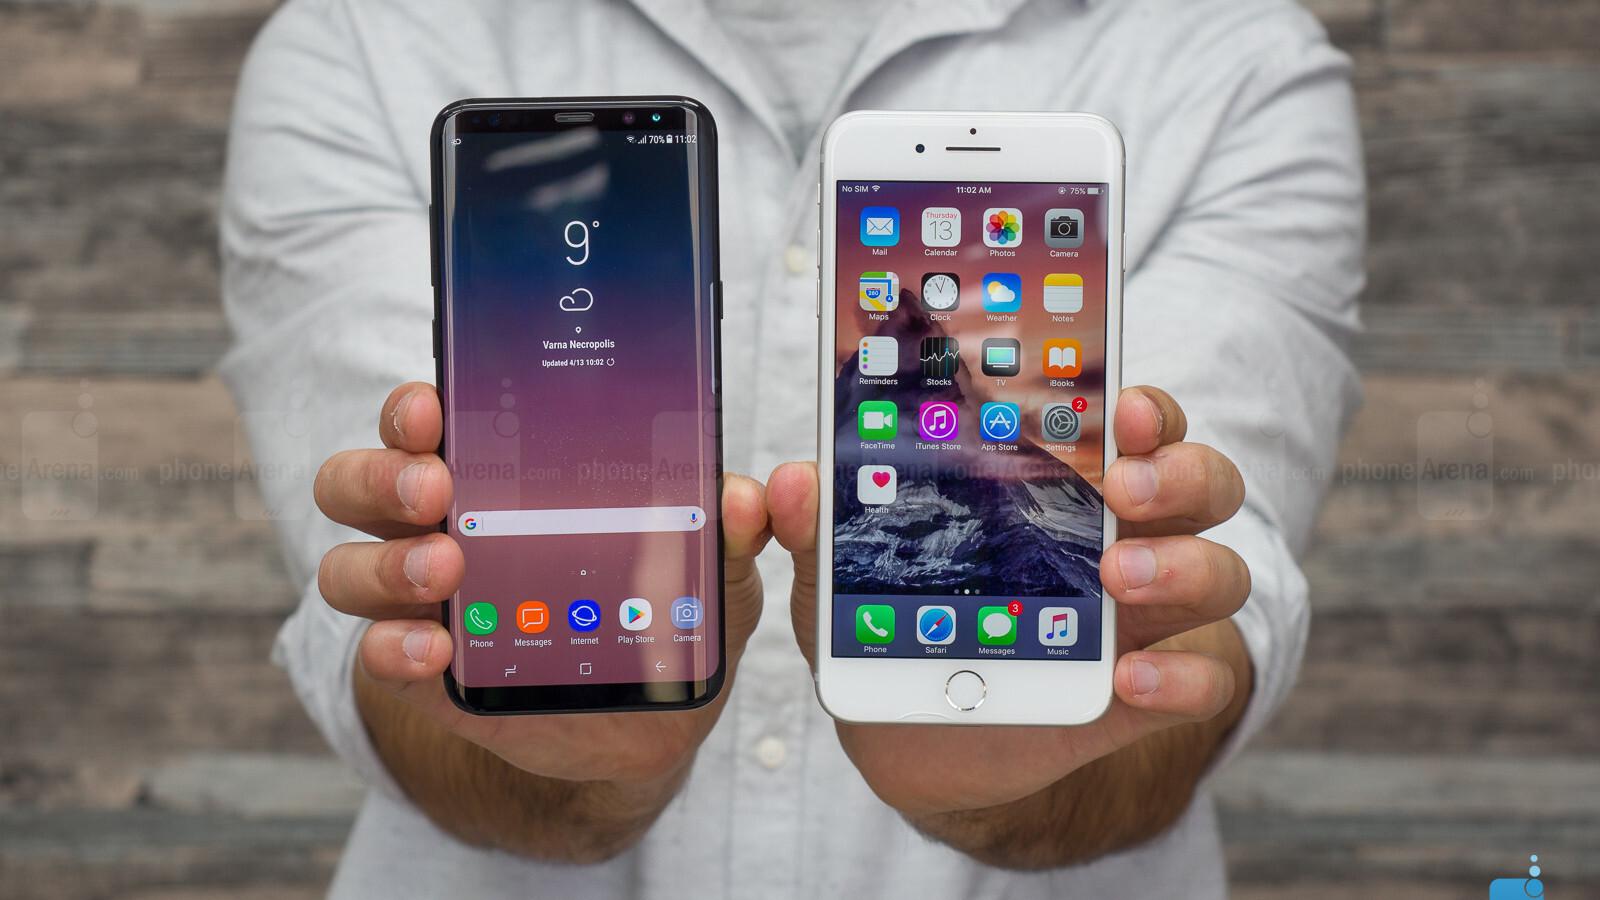 Galaxy S8 Plus Vs Iphone 7 Plus Battery Life